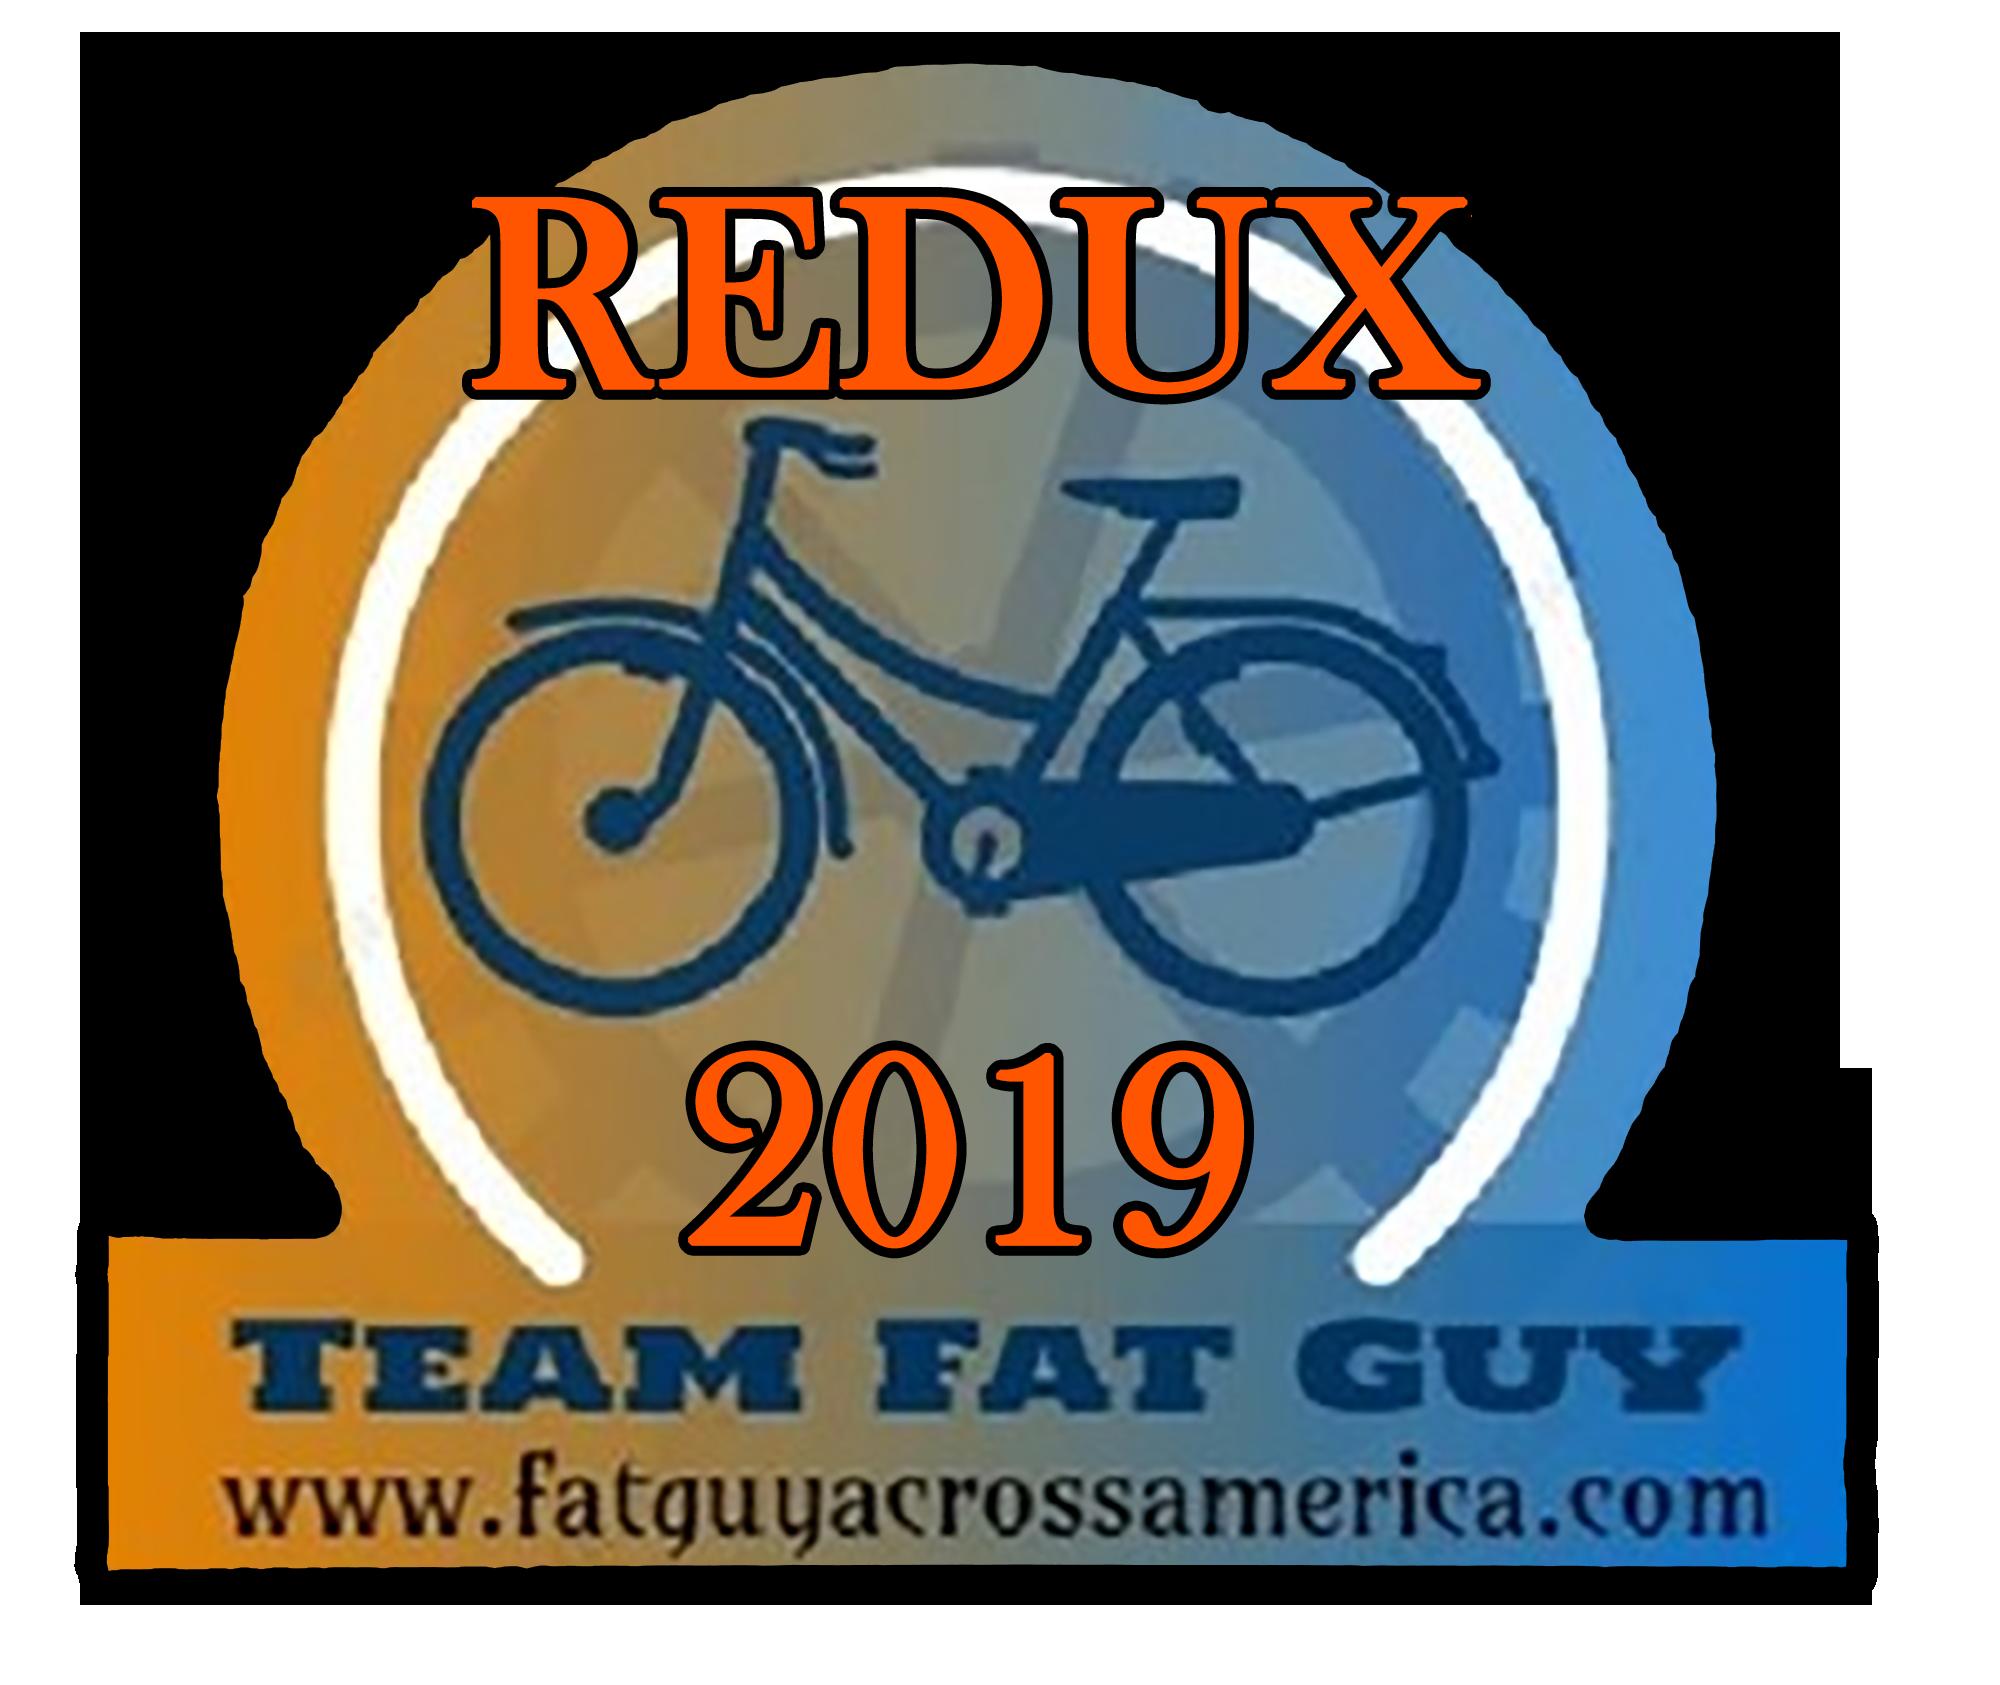 Team Fat Guy - Official Member List